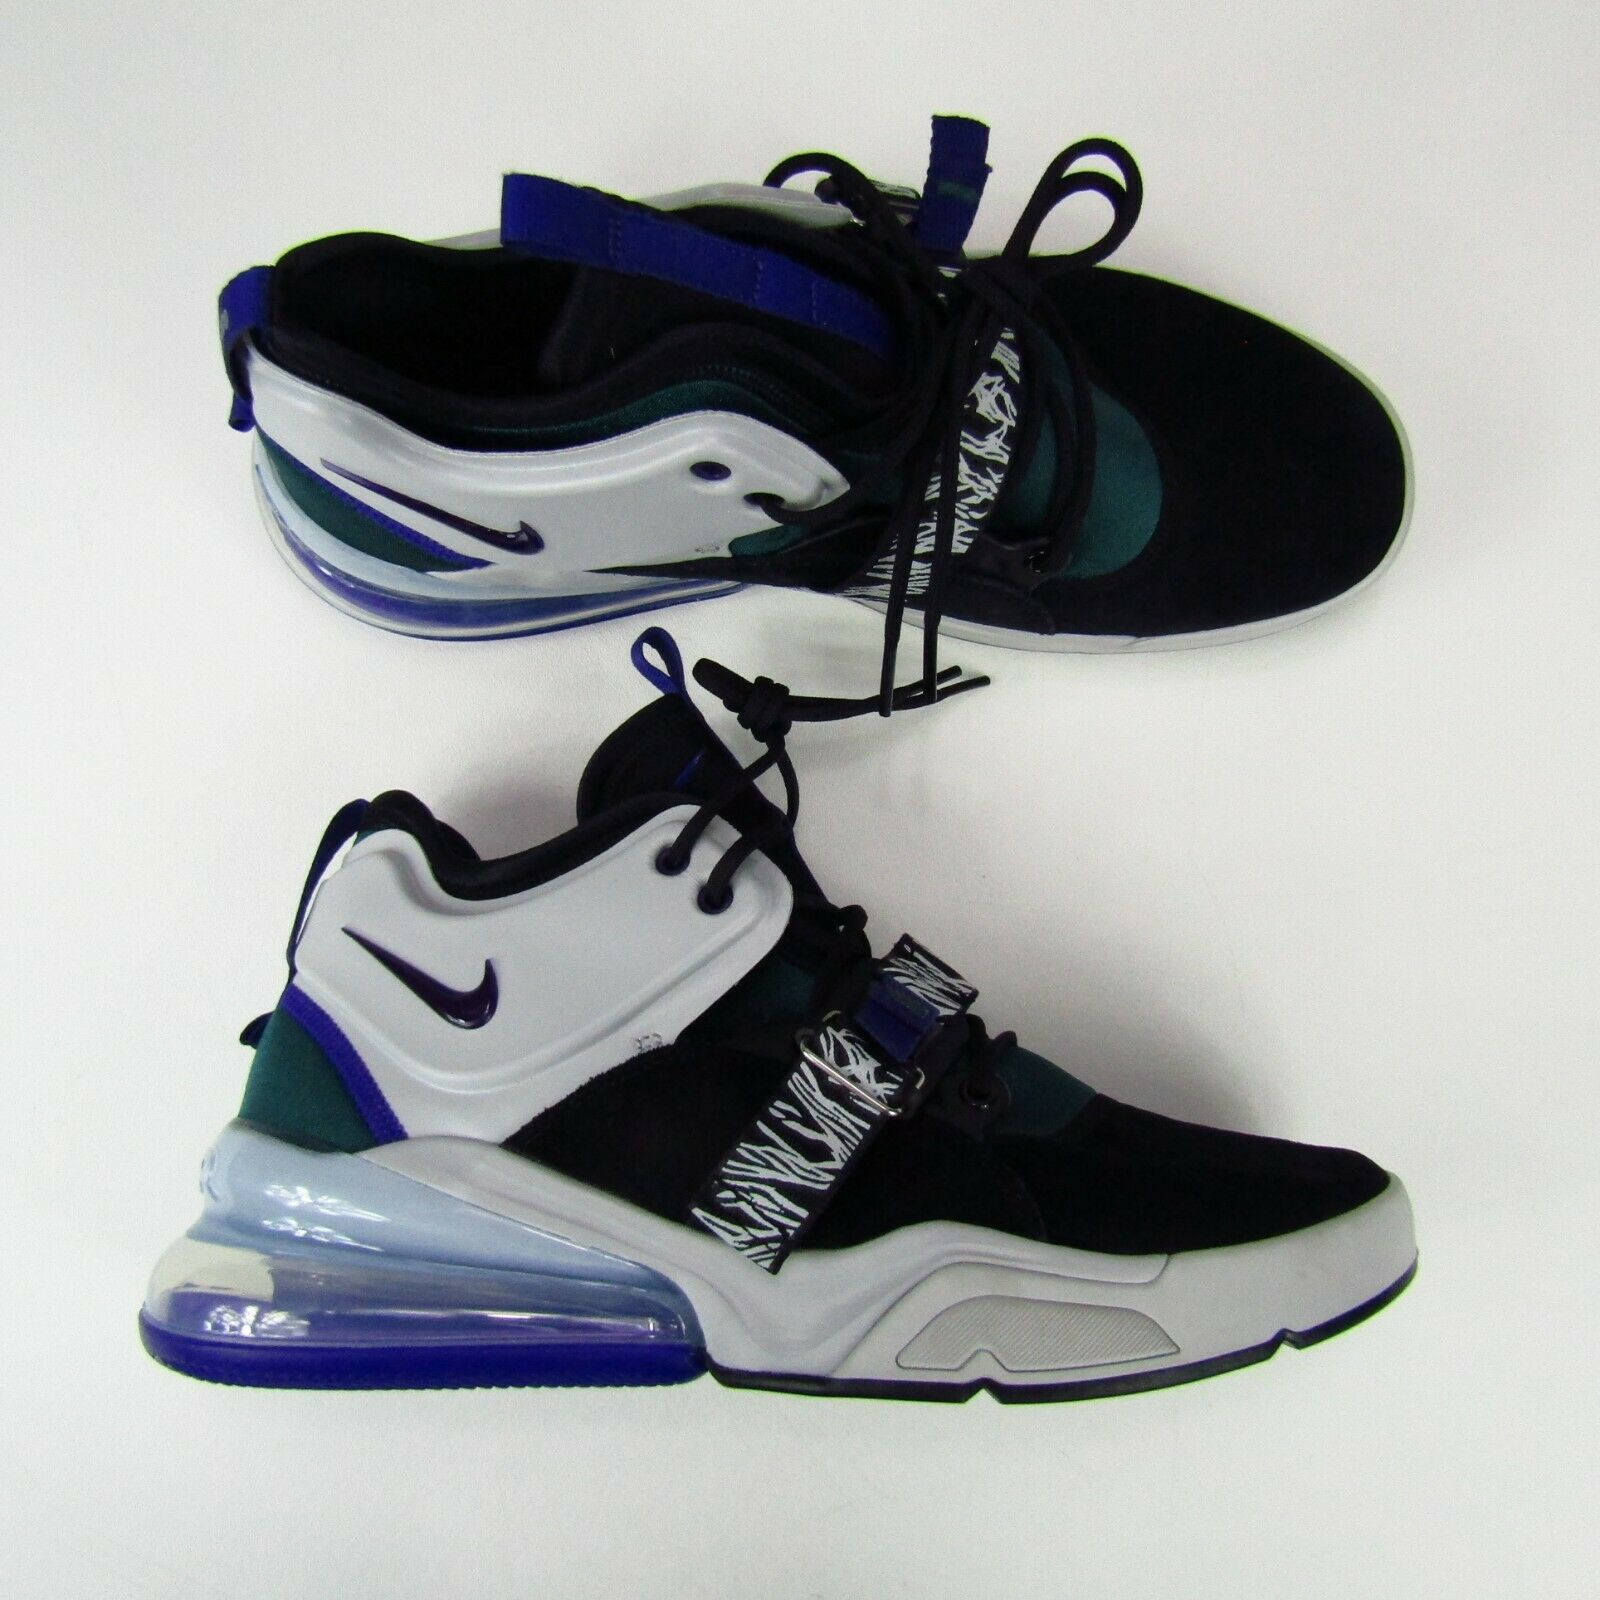 e99969537a Nike Air Force 270 AH6772-005 Carnivore Black Court Purple 11.5 US ...